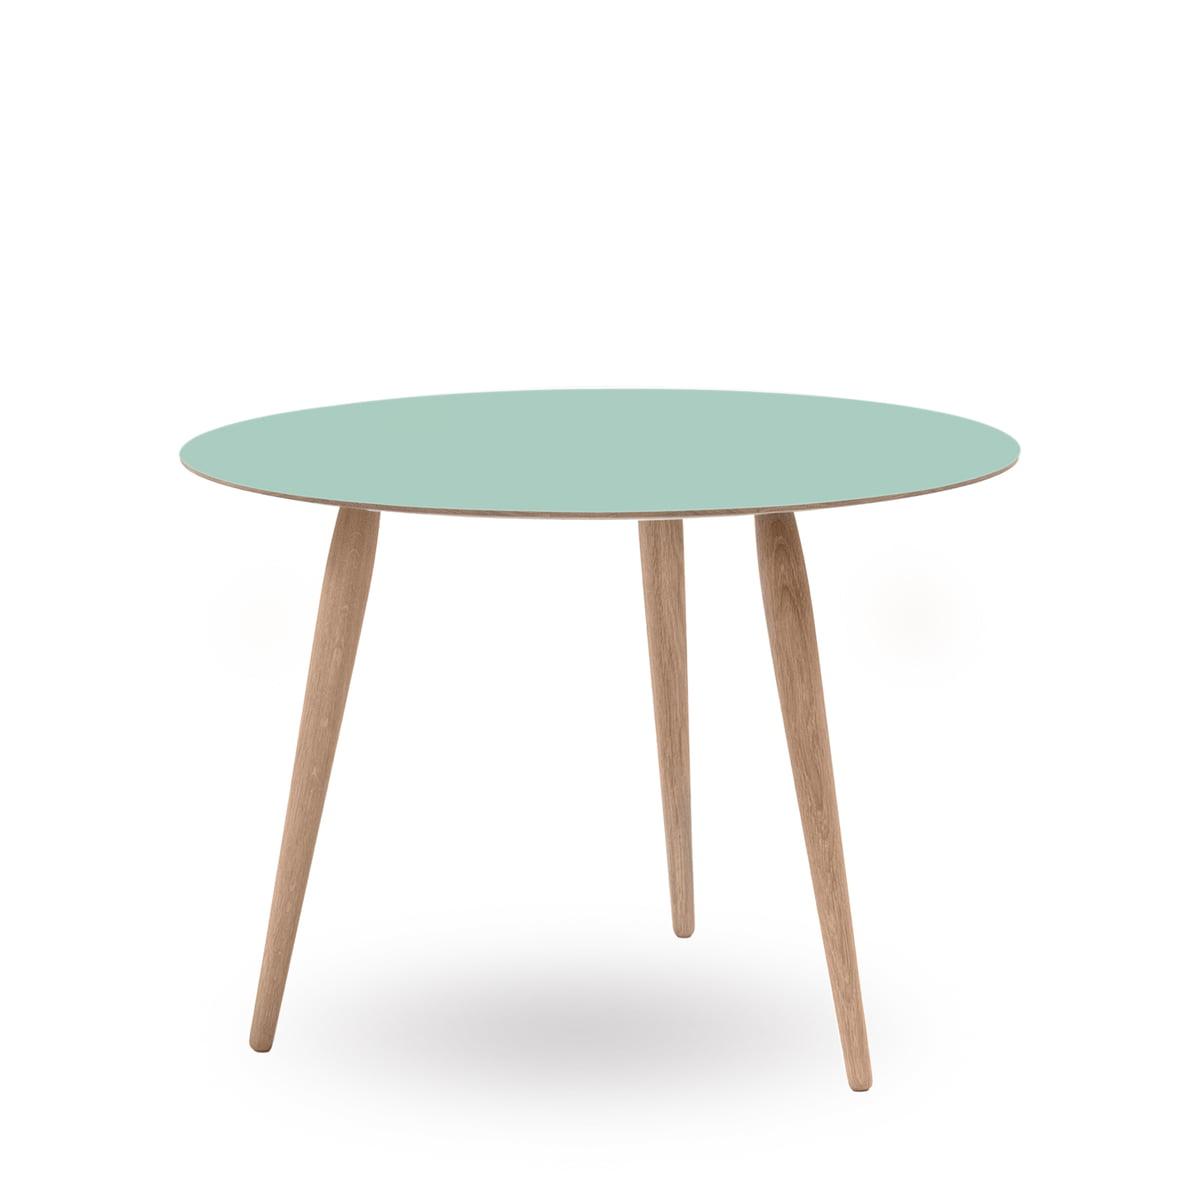 Play Round Laminate Side Table Ø 90 Cm By Bruunmunch In Dusty Jade / Oak  White